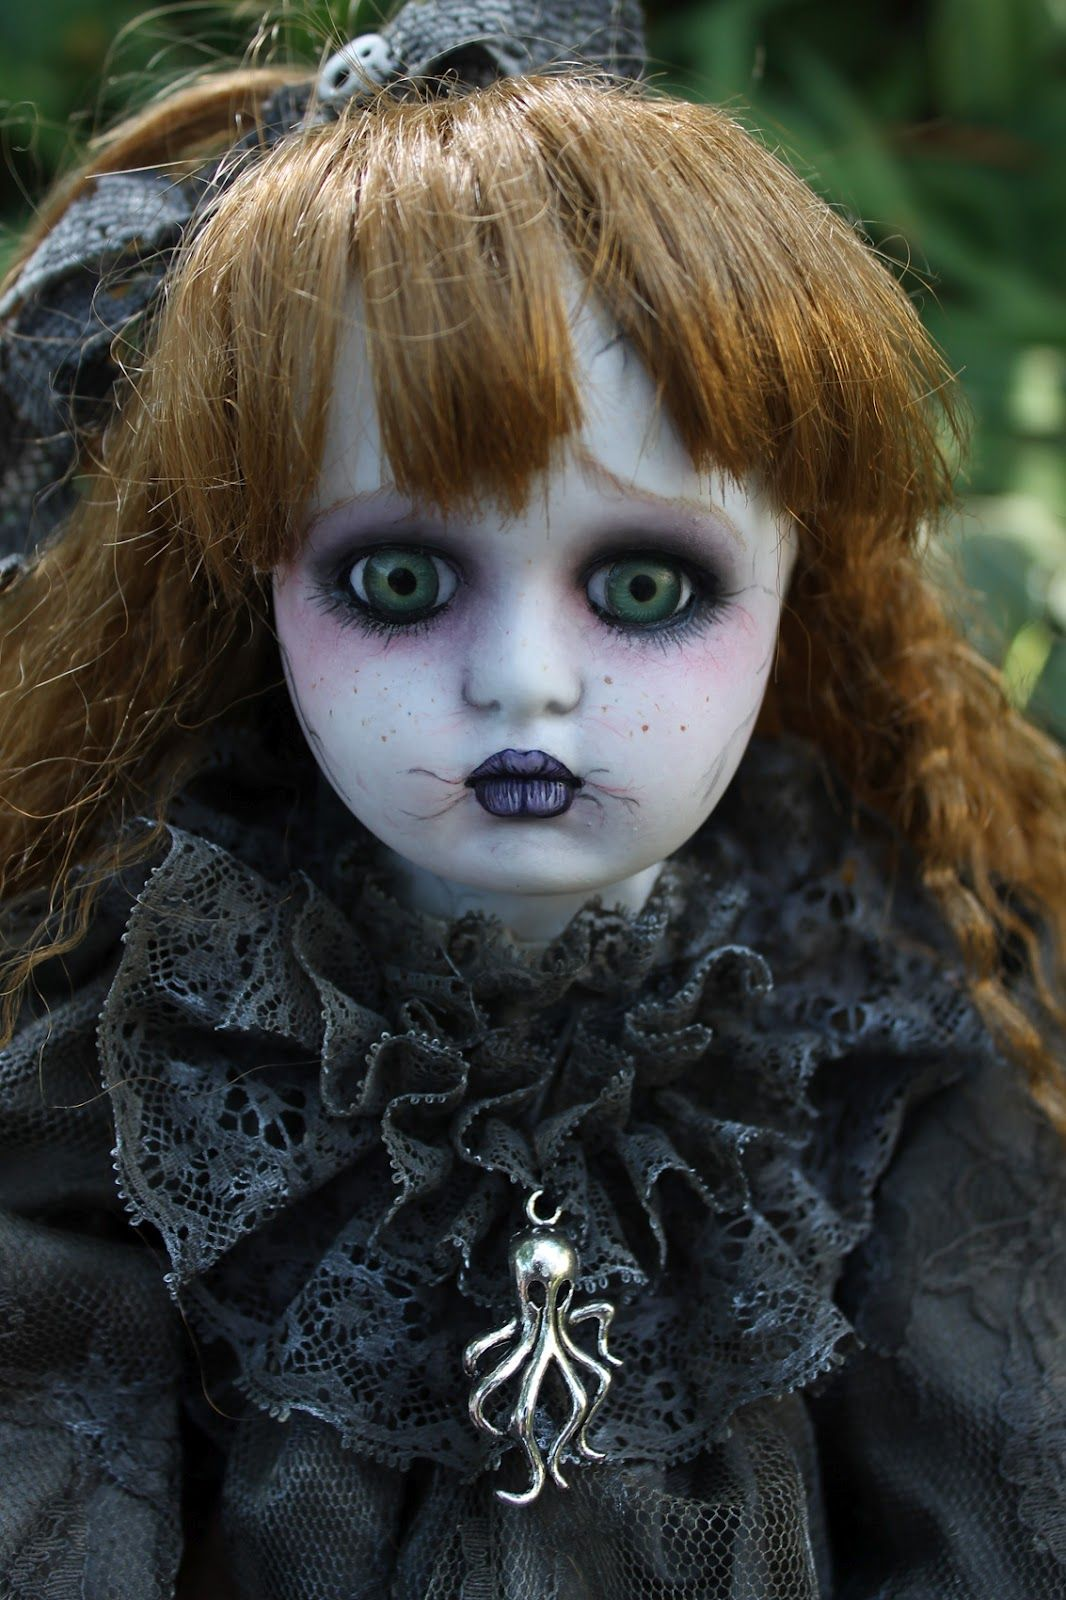 anne marie gibbons monster high repaints & customs: gothic porcelain